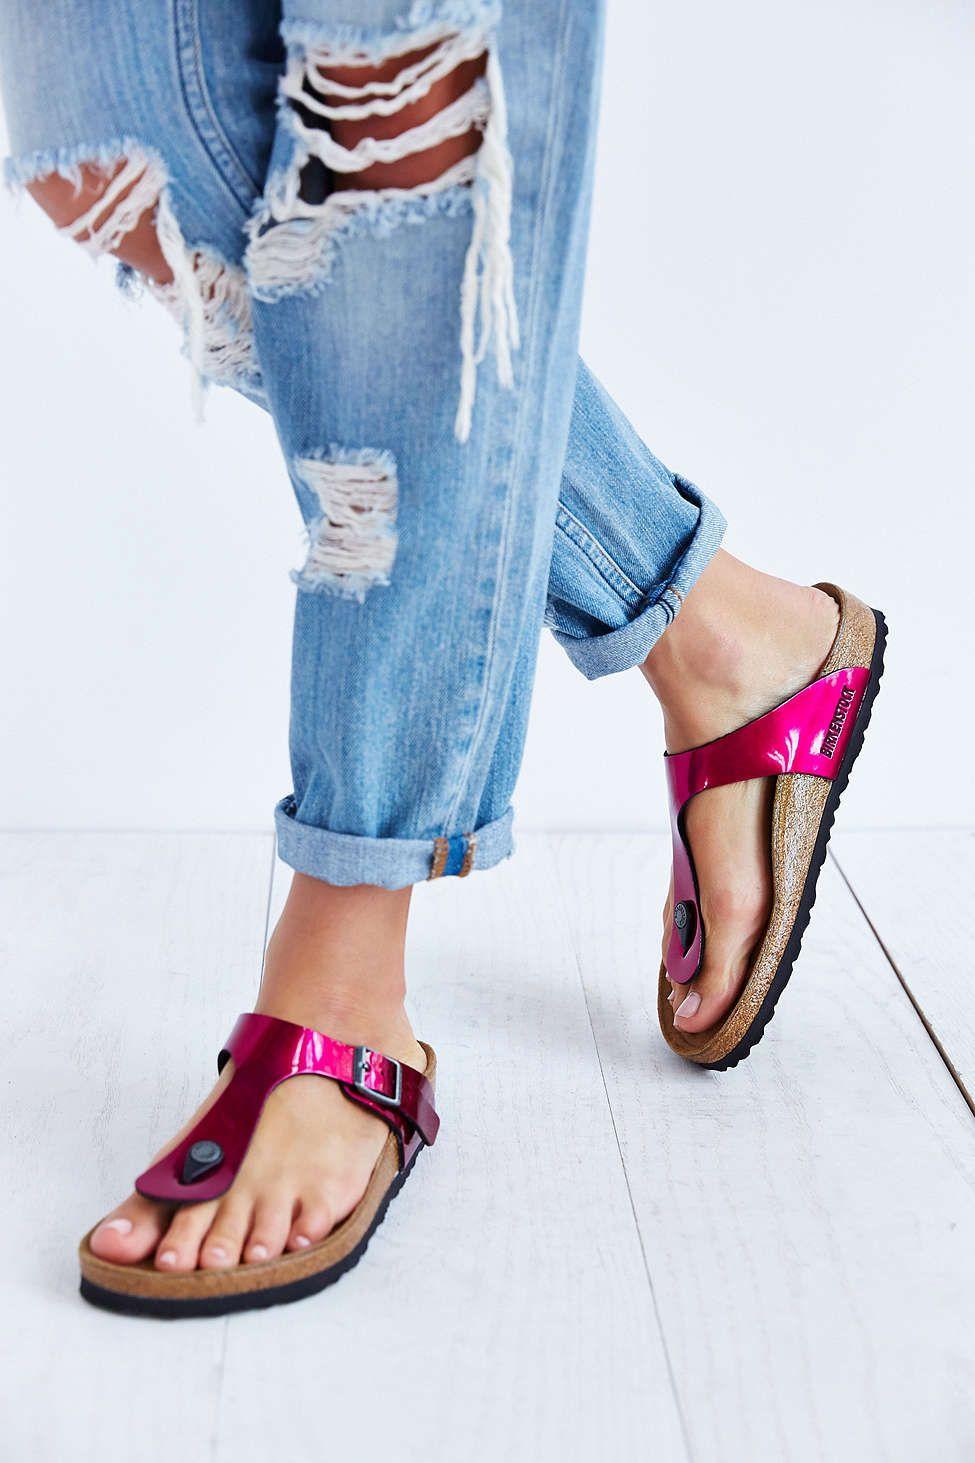 uRZUemiKK7 Flat Thong Sandals - Gizeh dzymsh